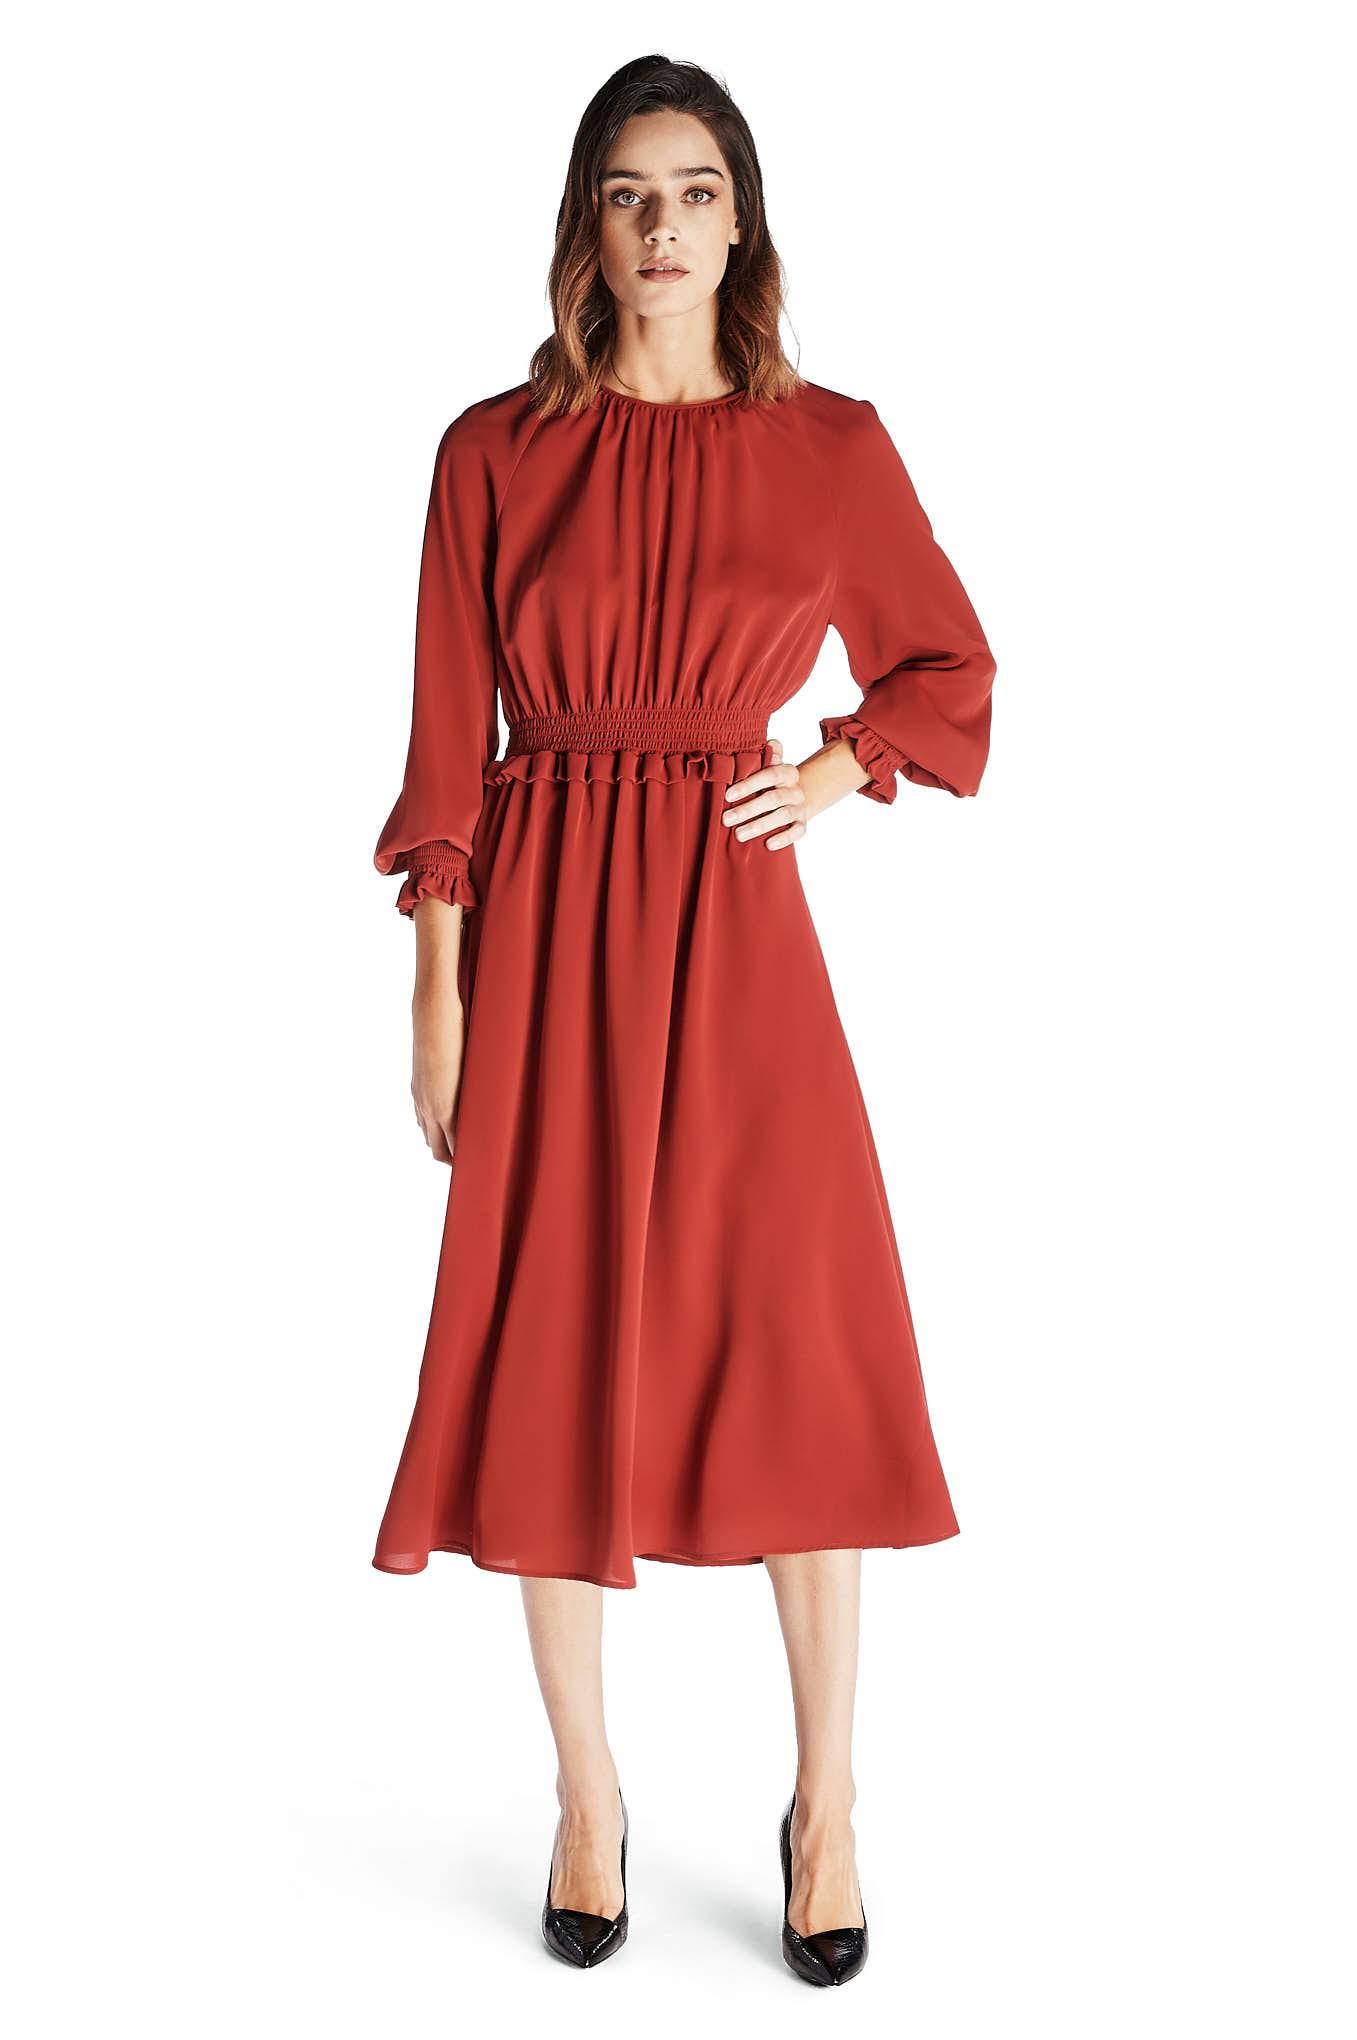 Vestido Vermelho Fantasy Mulher